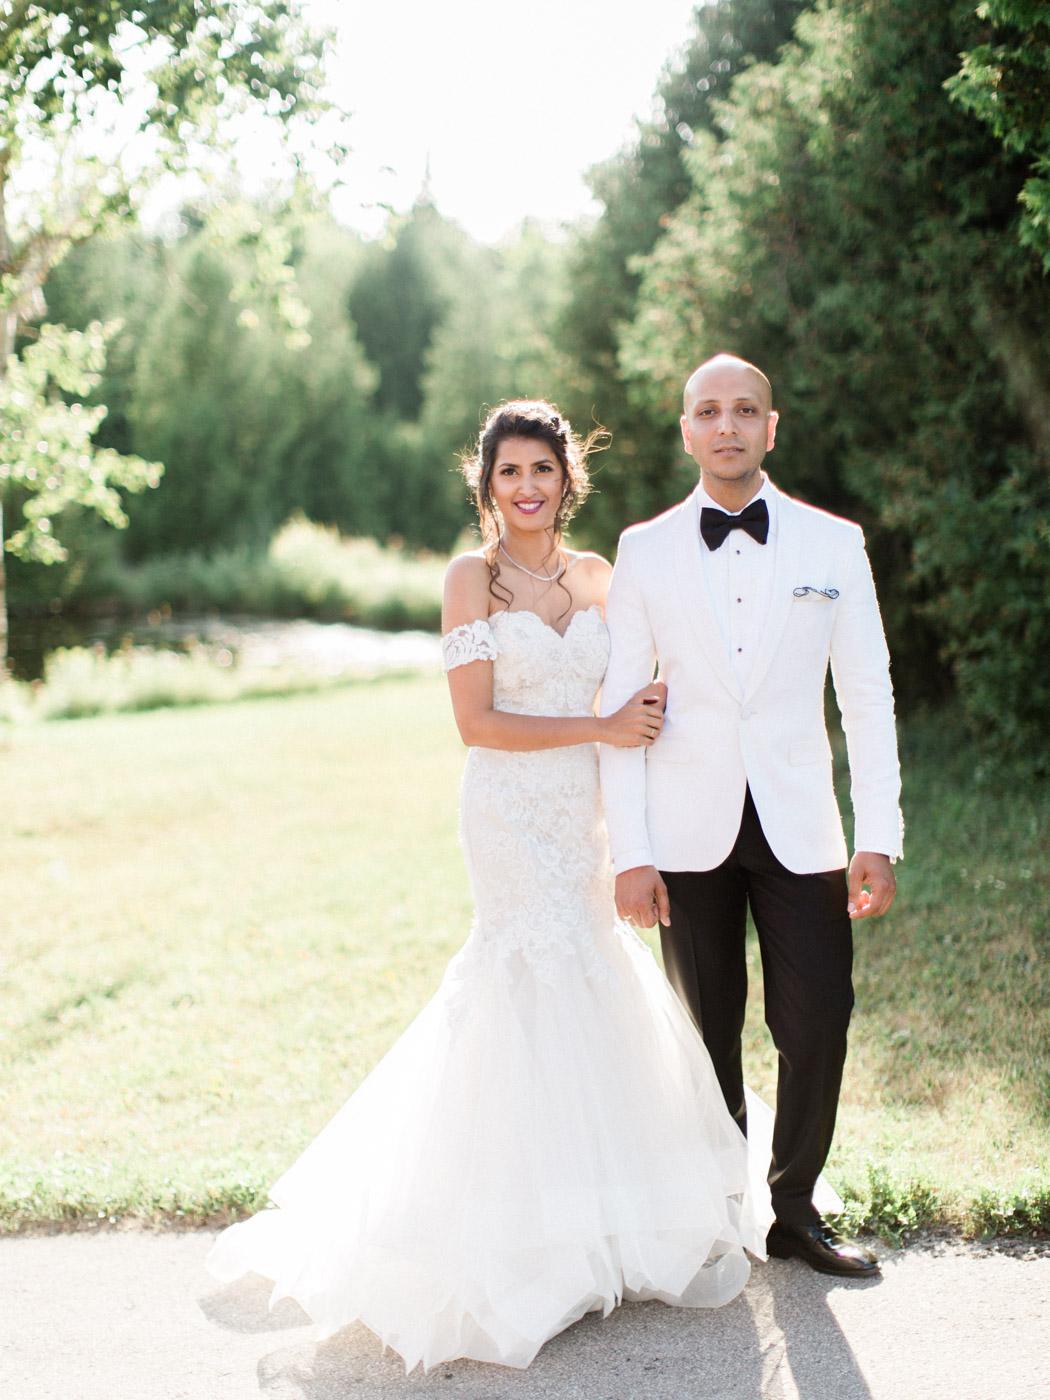 Toronto-Collingwood-wedding-photographer-indian-wedding-documentary144.jpg